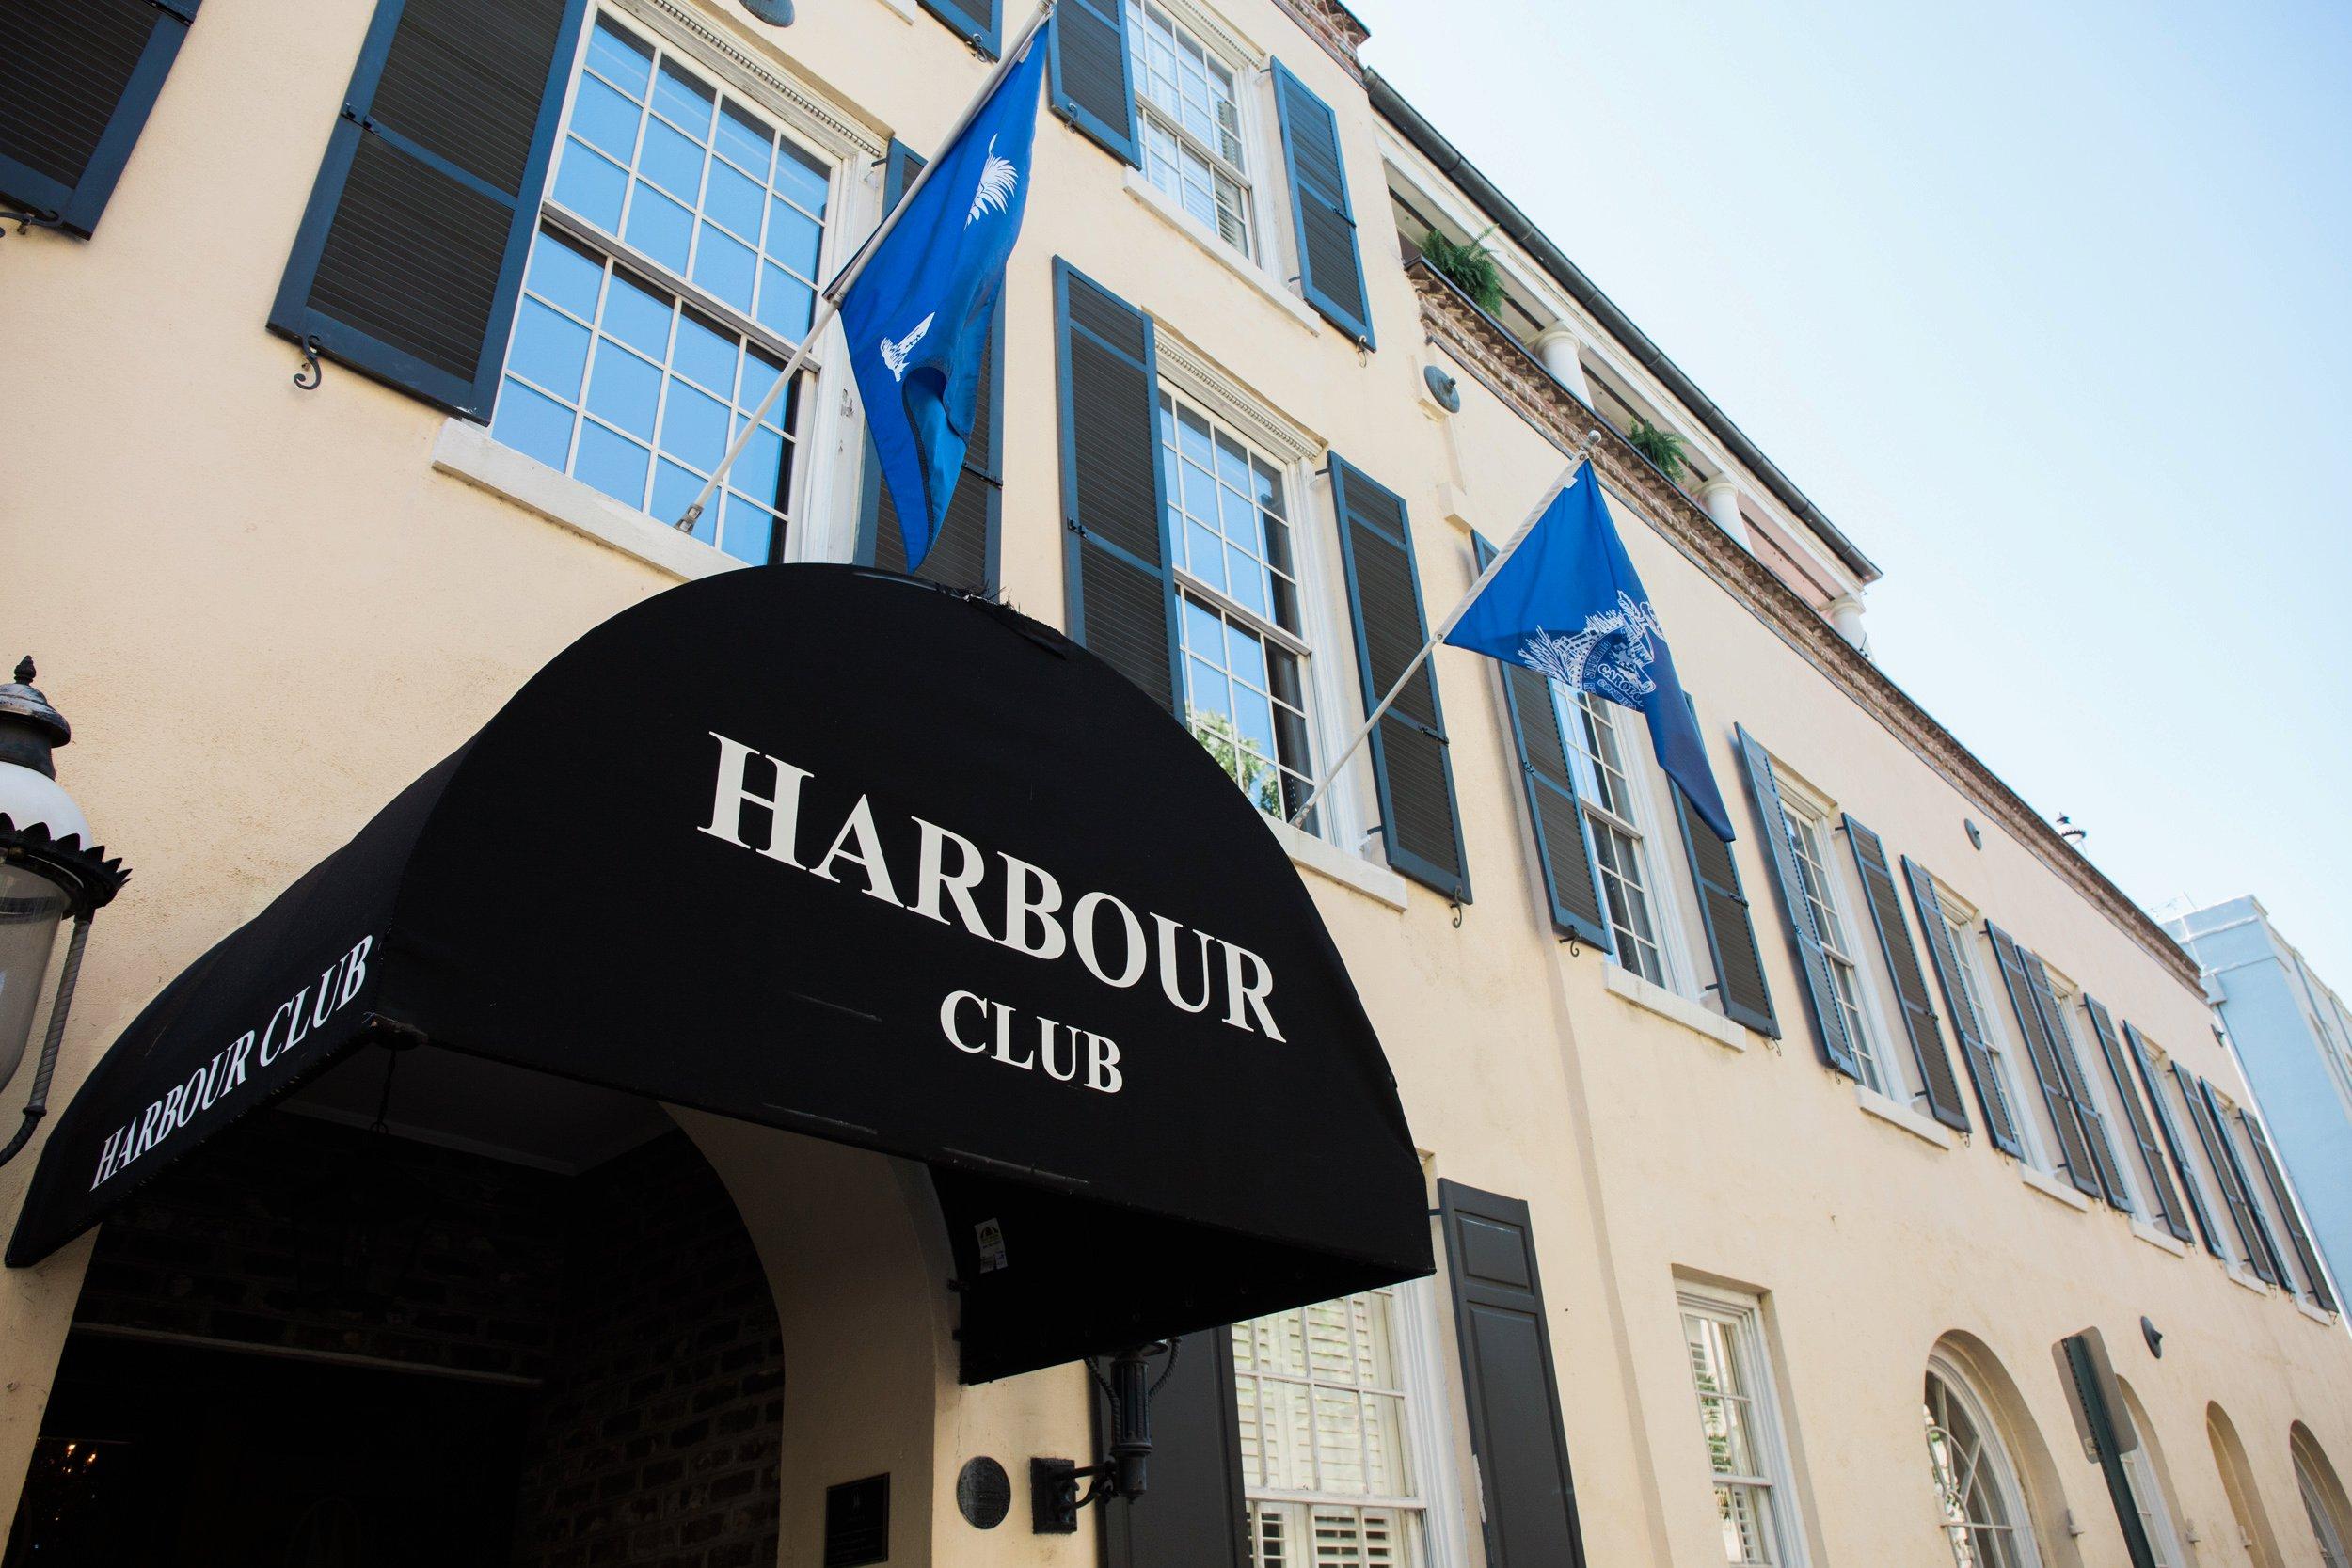 Harbour_club_Wedding_0020.jpg